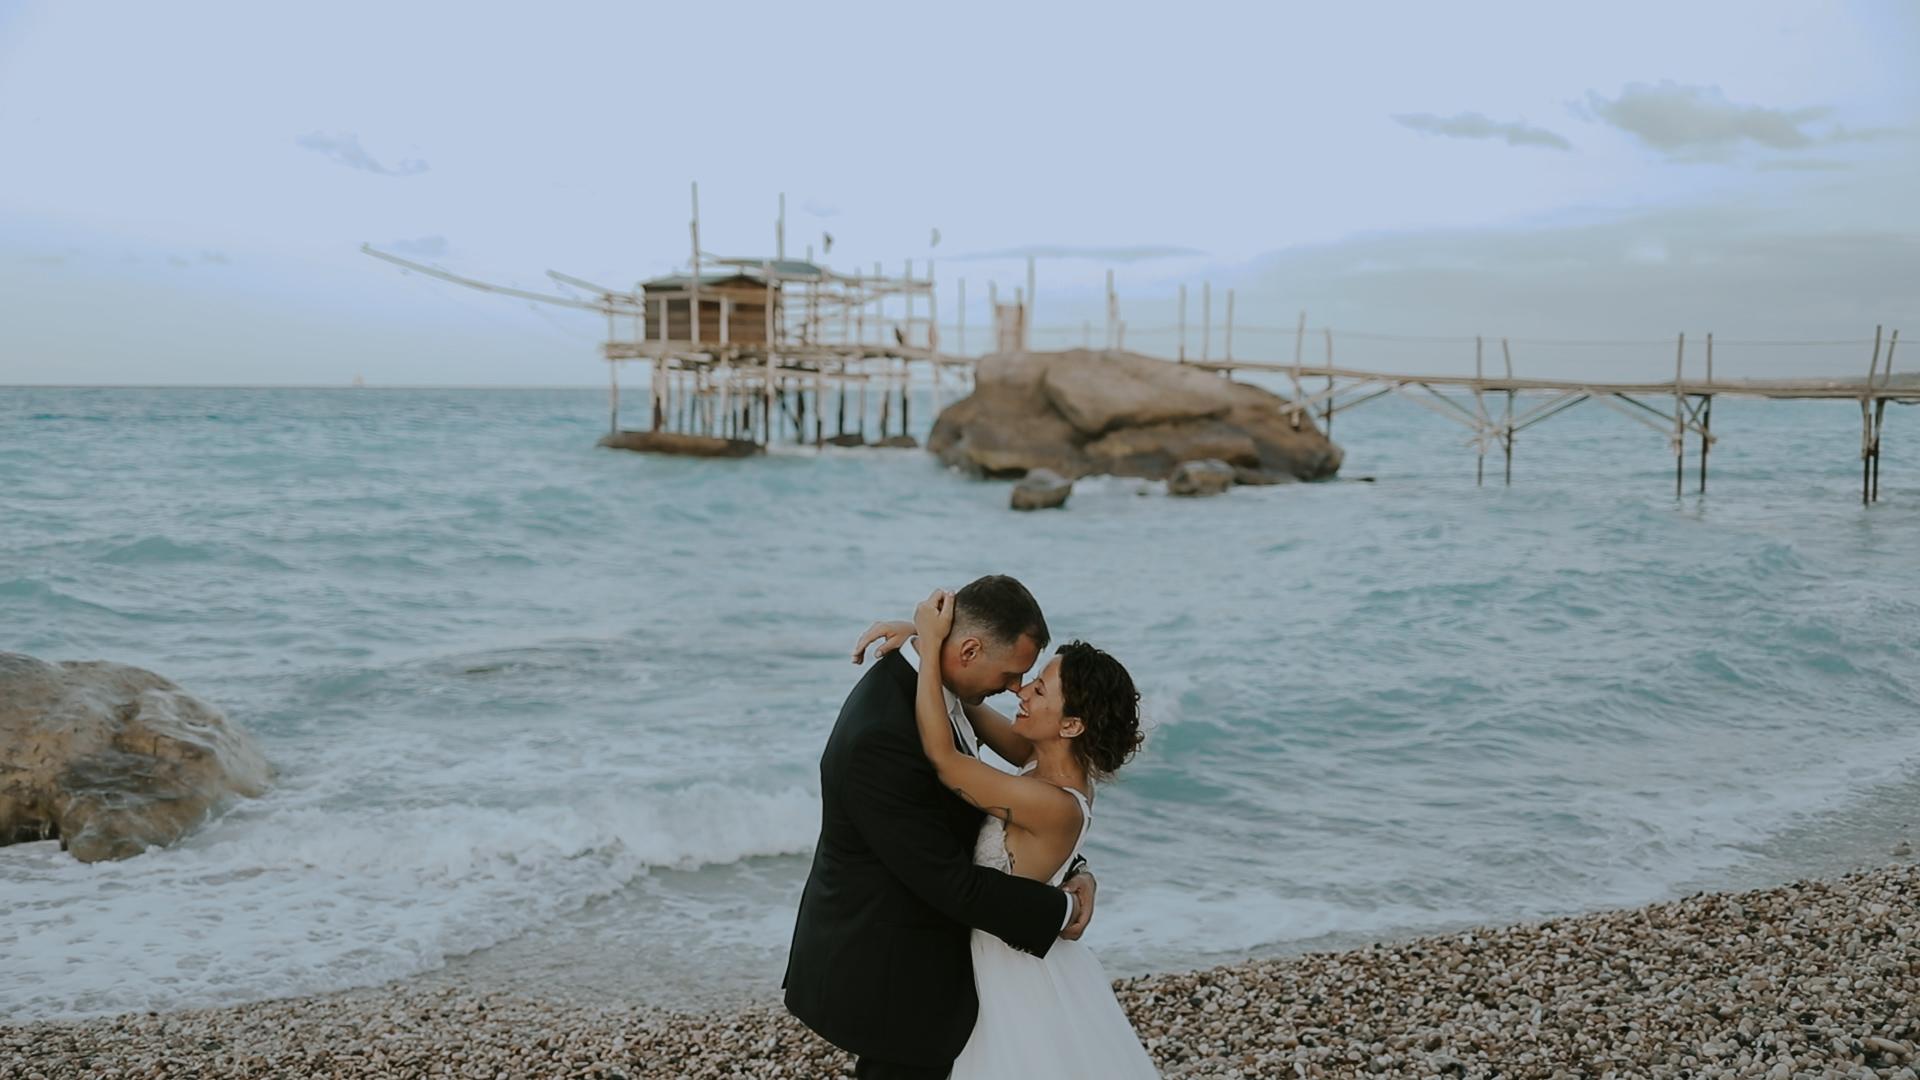 FILM.00_03_01_16.Immagine009 Matrimonio a Termoli